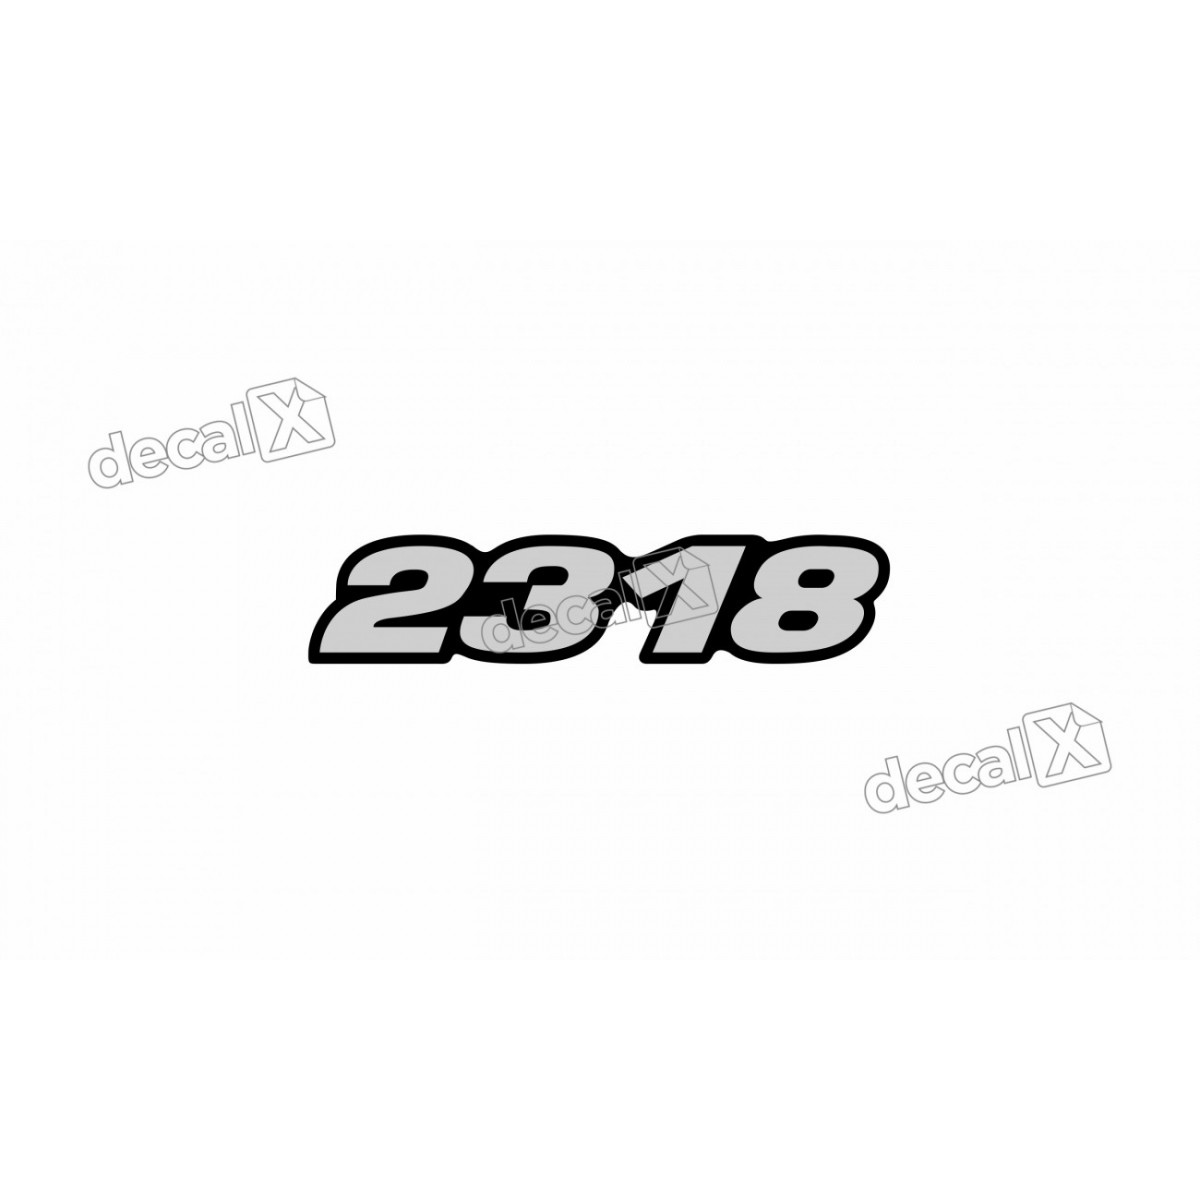 Adesivo Emblema Resinado Mercedes 2318 Cm83 Decalx